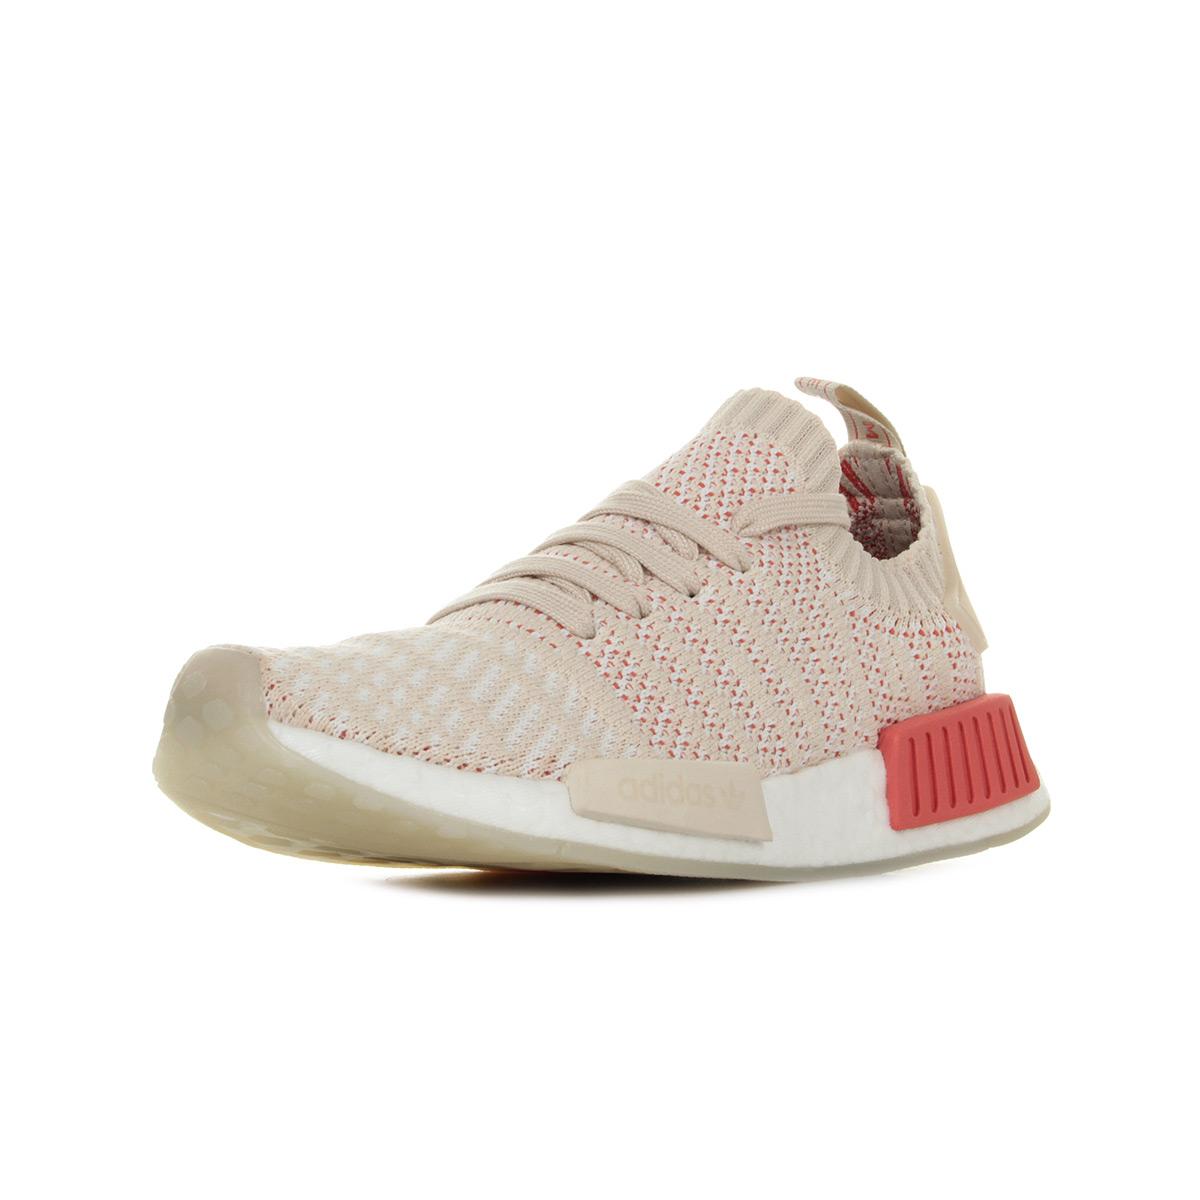 Details zu Schuhe adidas Damen Nmd R1 Stlt Pk W Beige